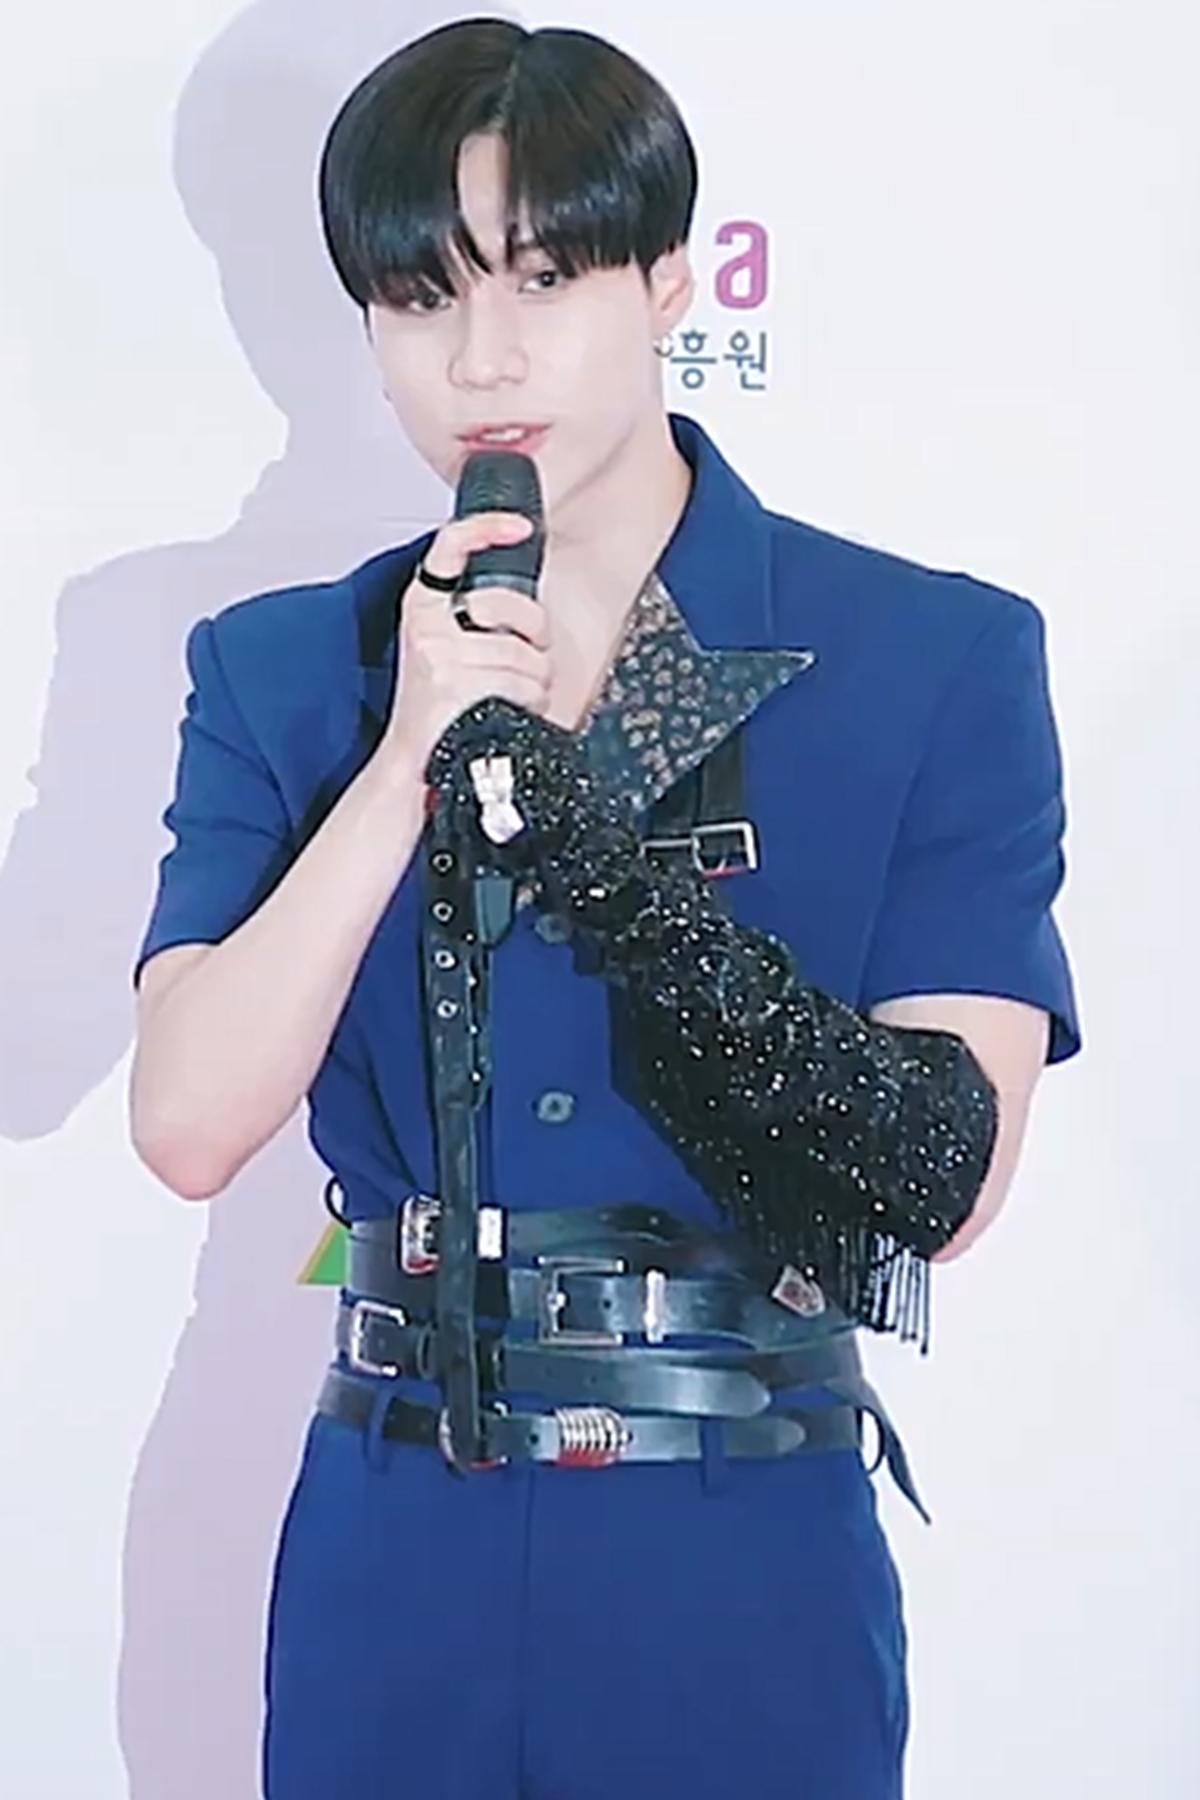 Lee Tae Min Discography Wikipedia April 1, 2020 mini album 1. lee tae min discography wikipedia